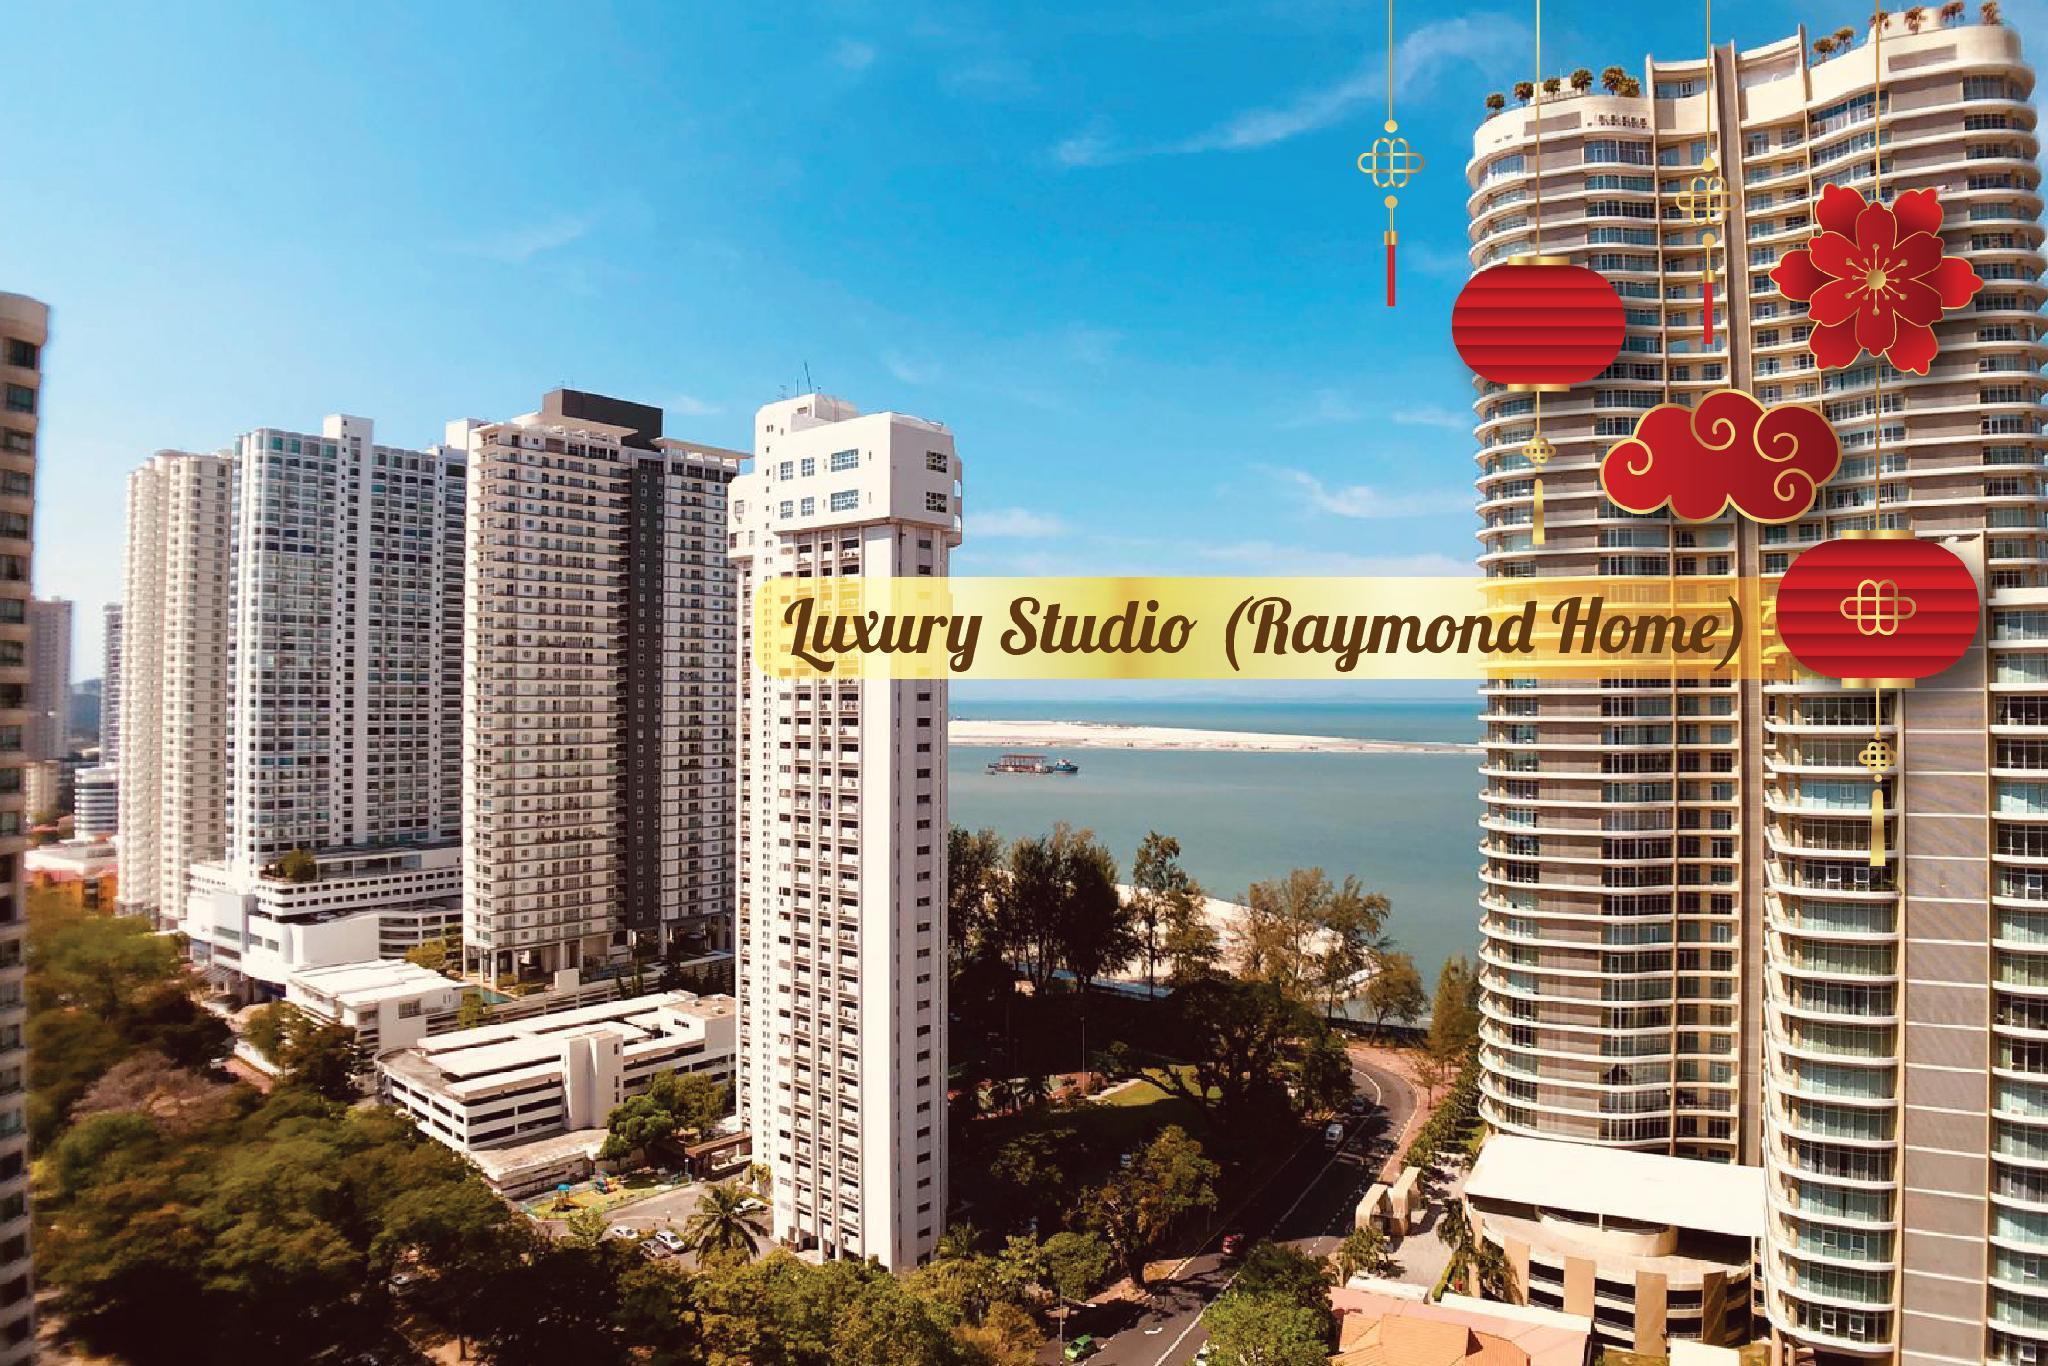 Luxury Studio  Raymond Home